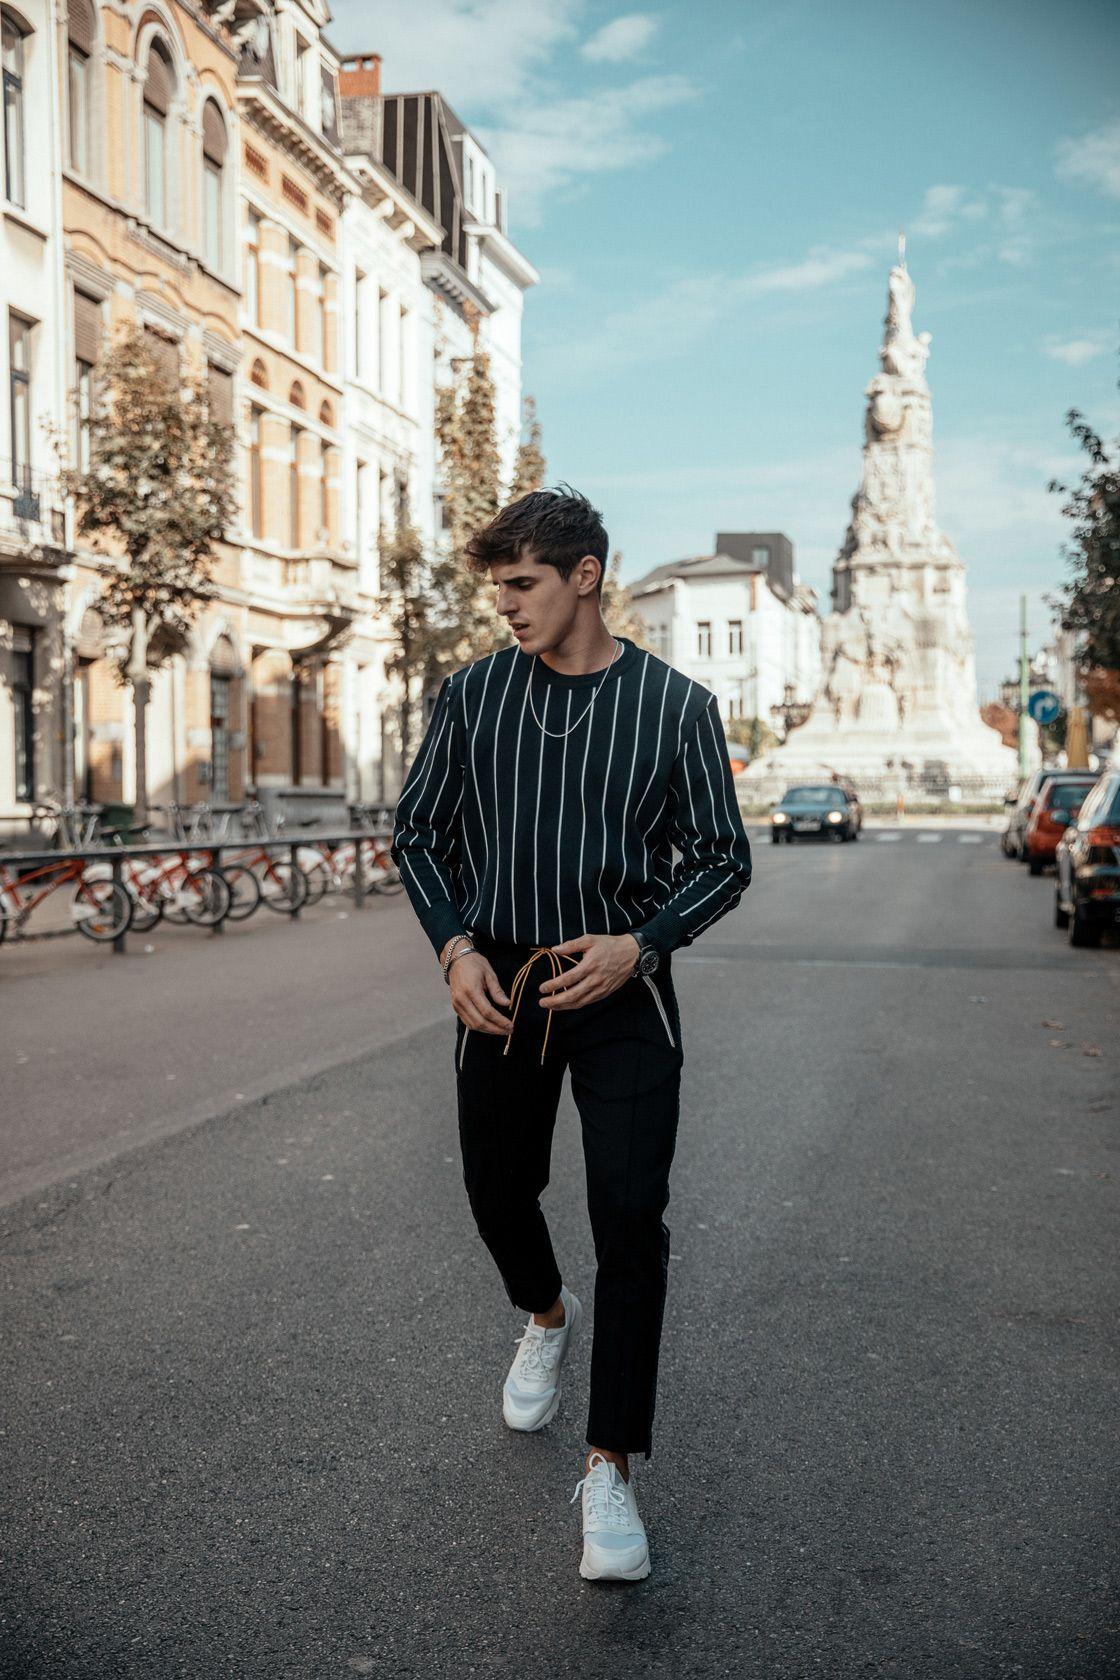 Striped City Boy City Lifestyle Zara Shop City Boy